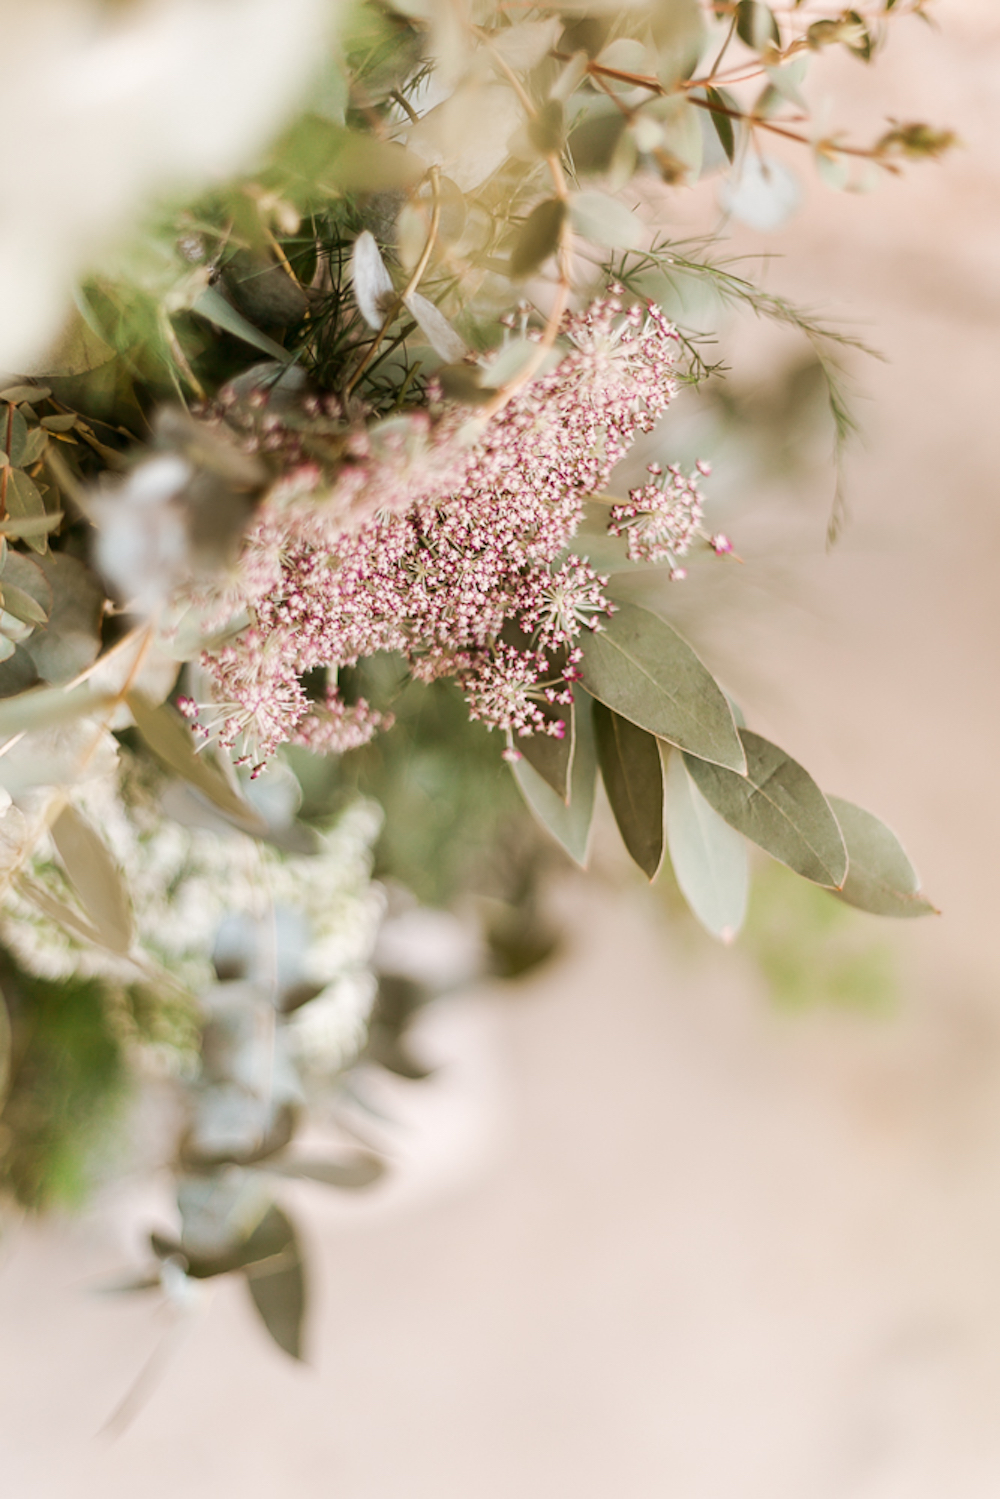 parisian-inspired-blog-mariage-shooting-inspiration-vegetal-abbaye-trois-fontaines-marne-cg-photographie-11.jpg